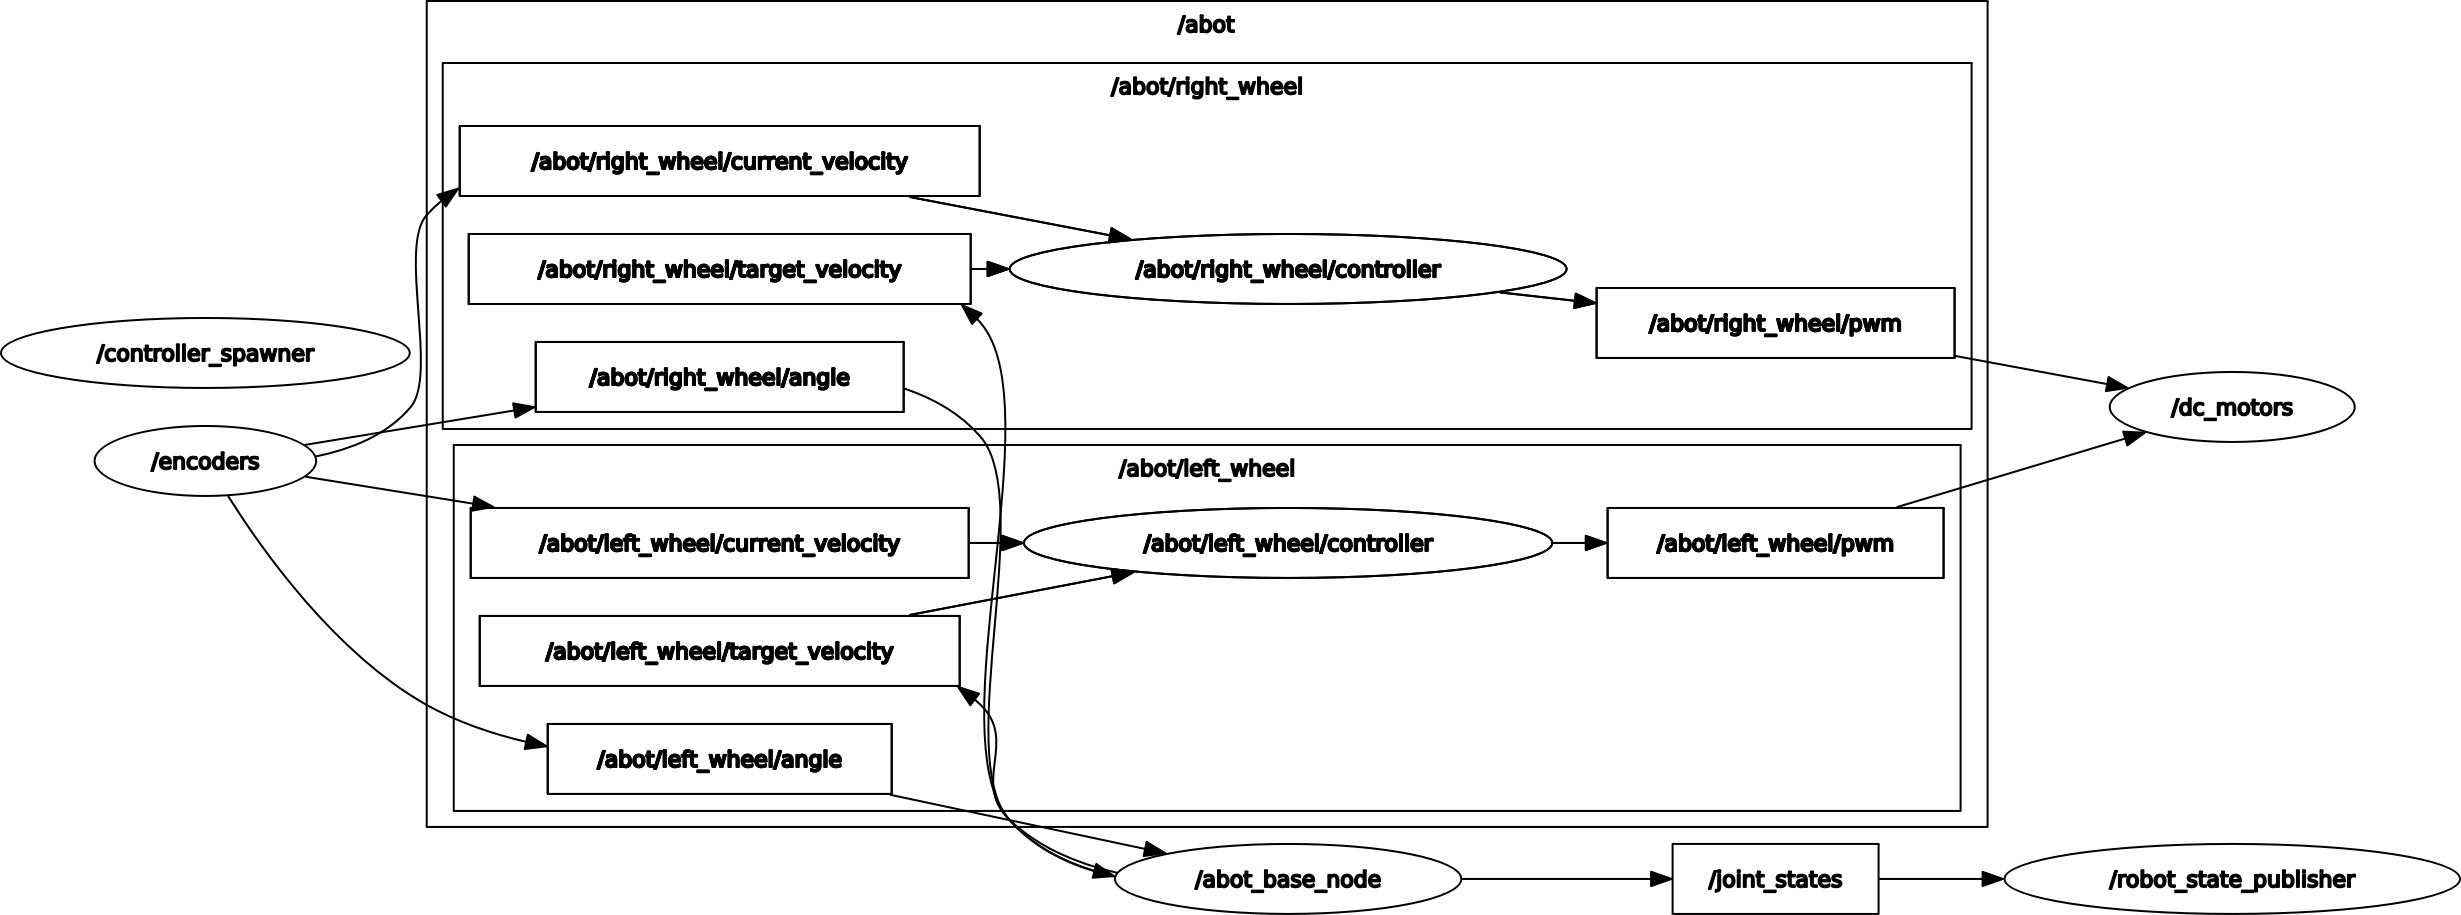 part_9_rqt_screen_1.png